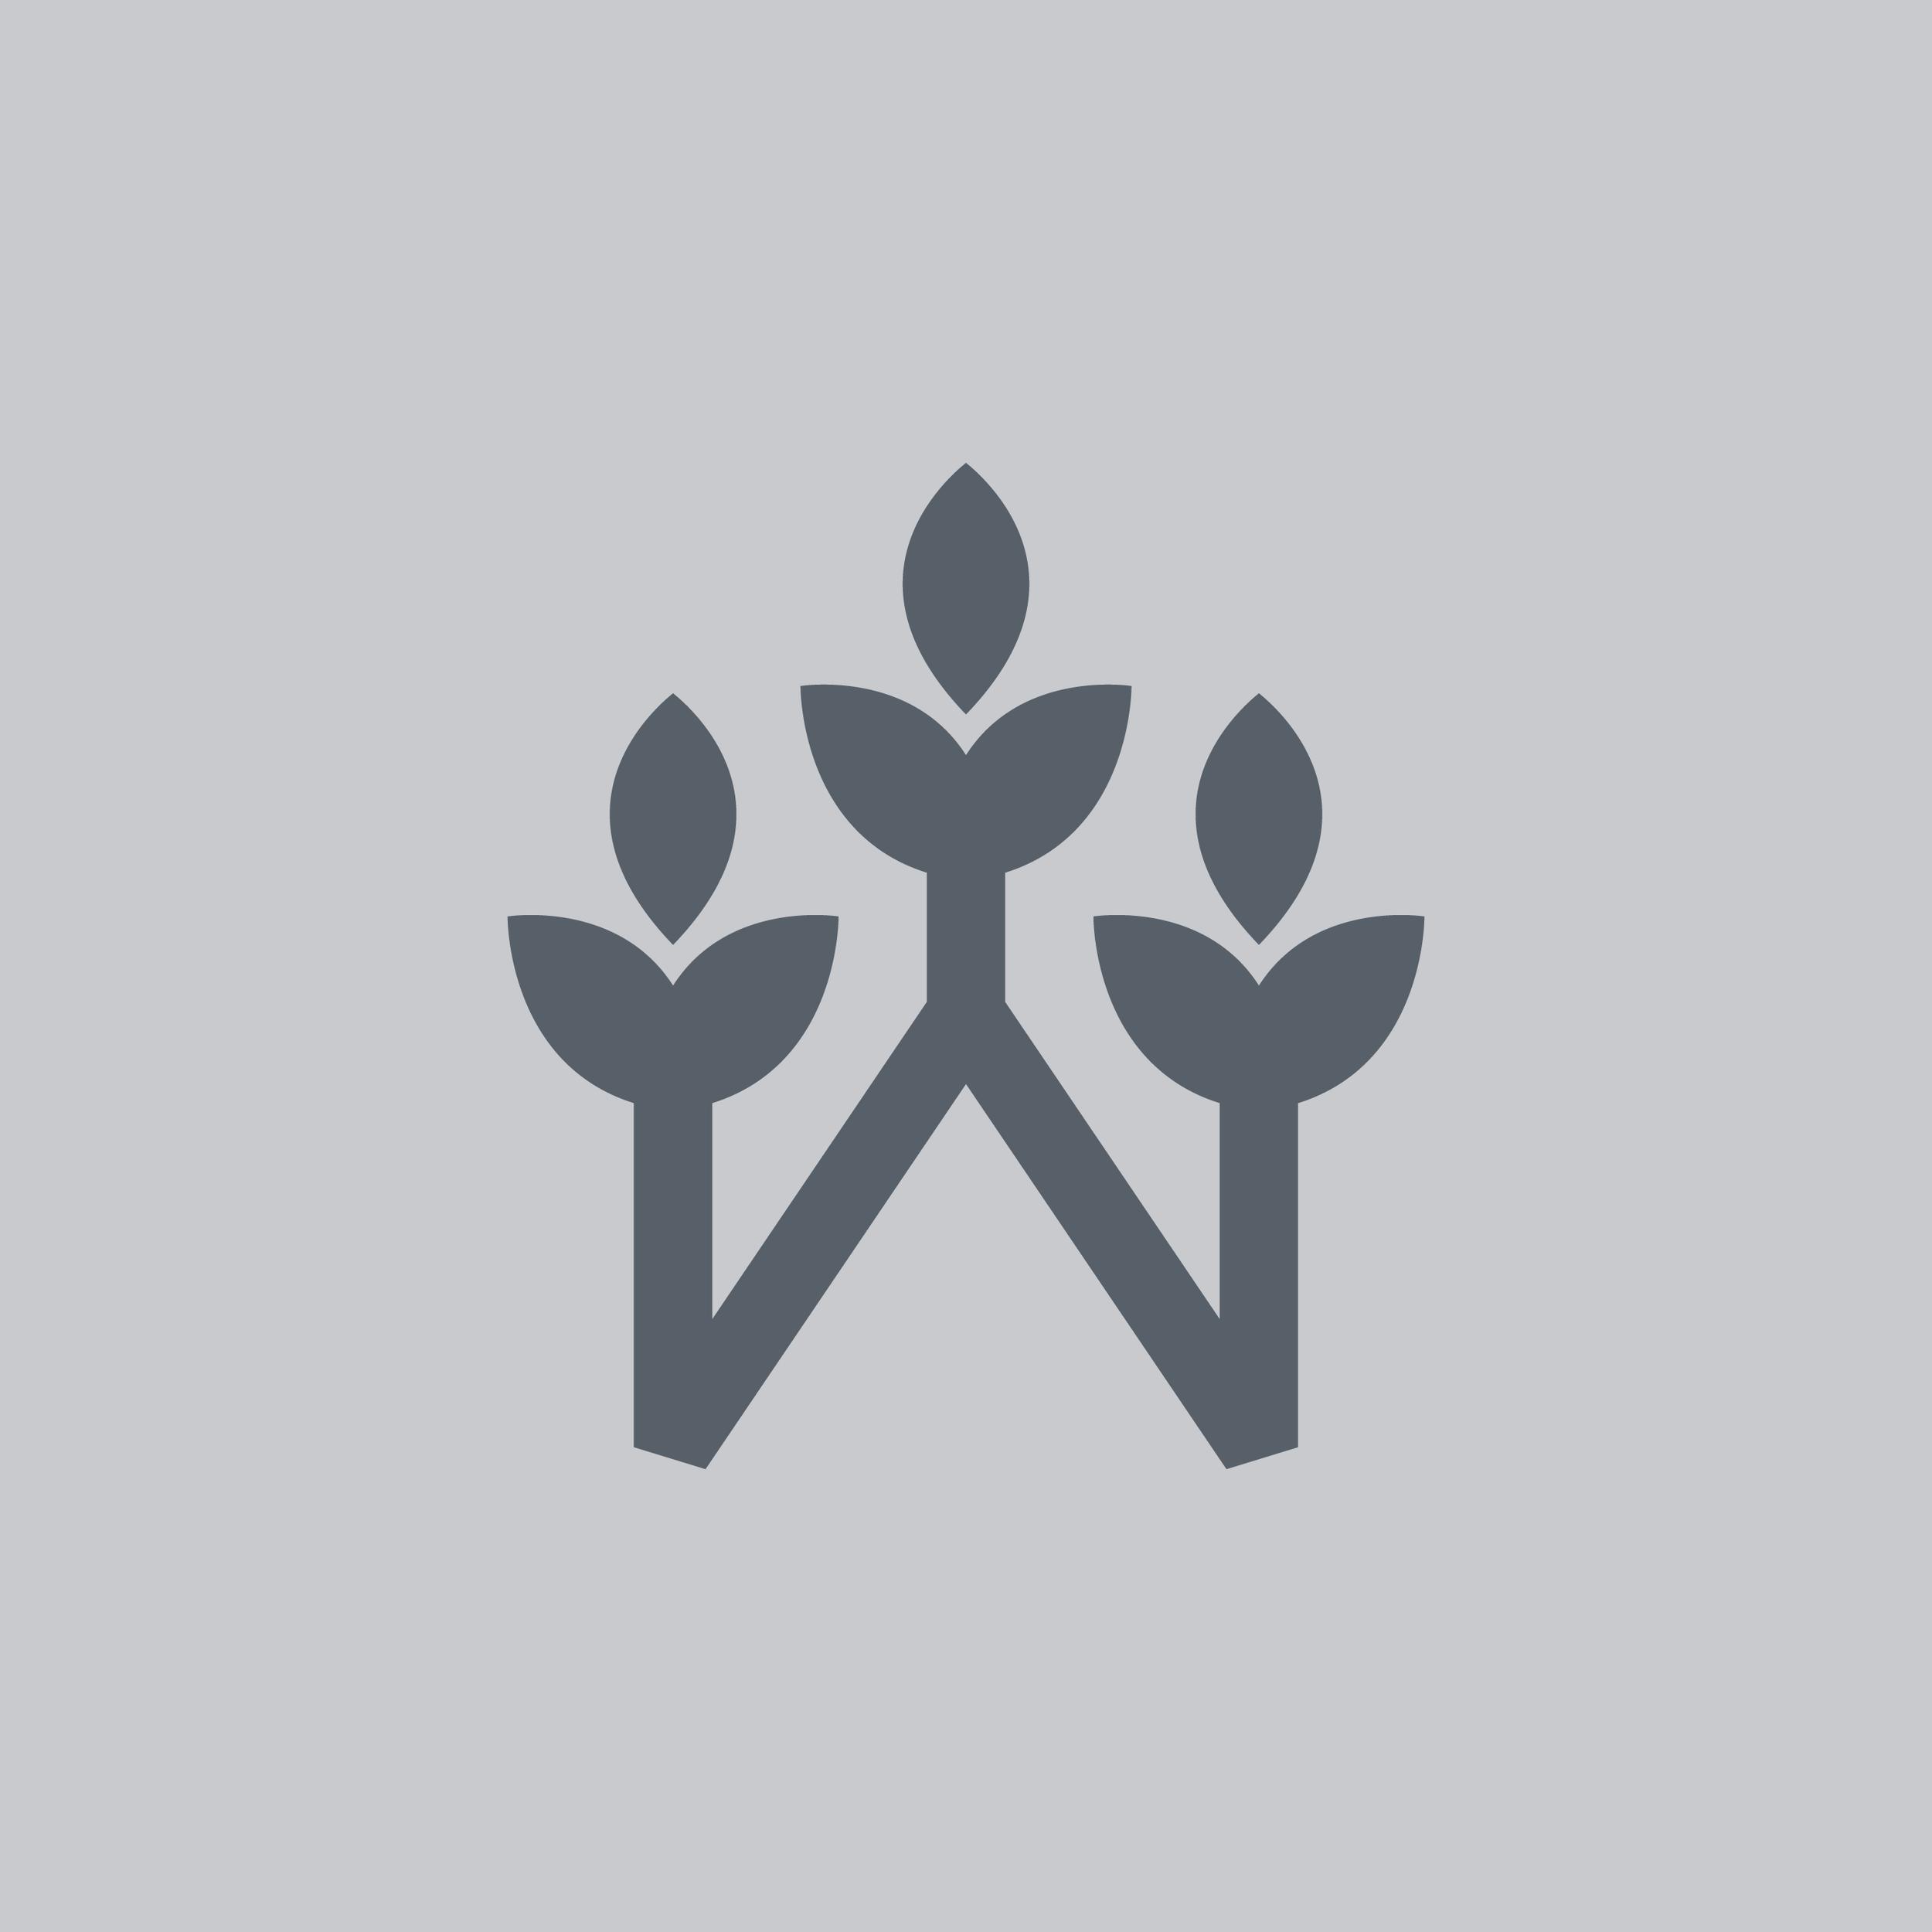 Henry David Thoreau - Walden - Designed by Chris Cureton